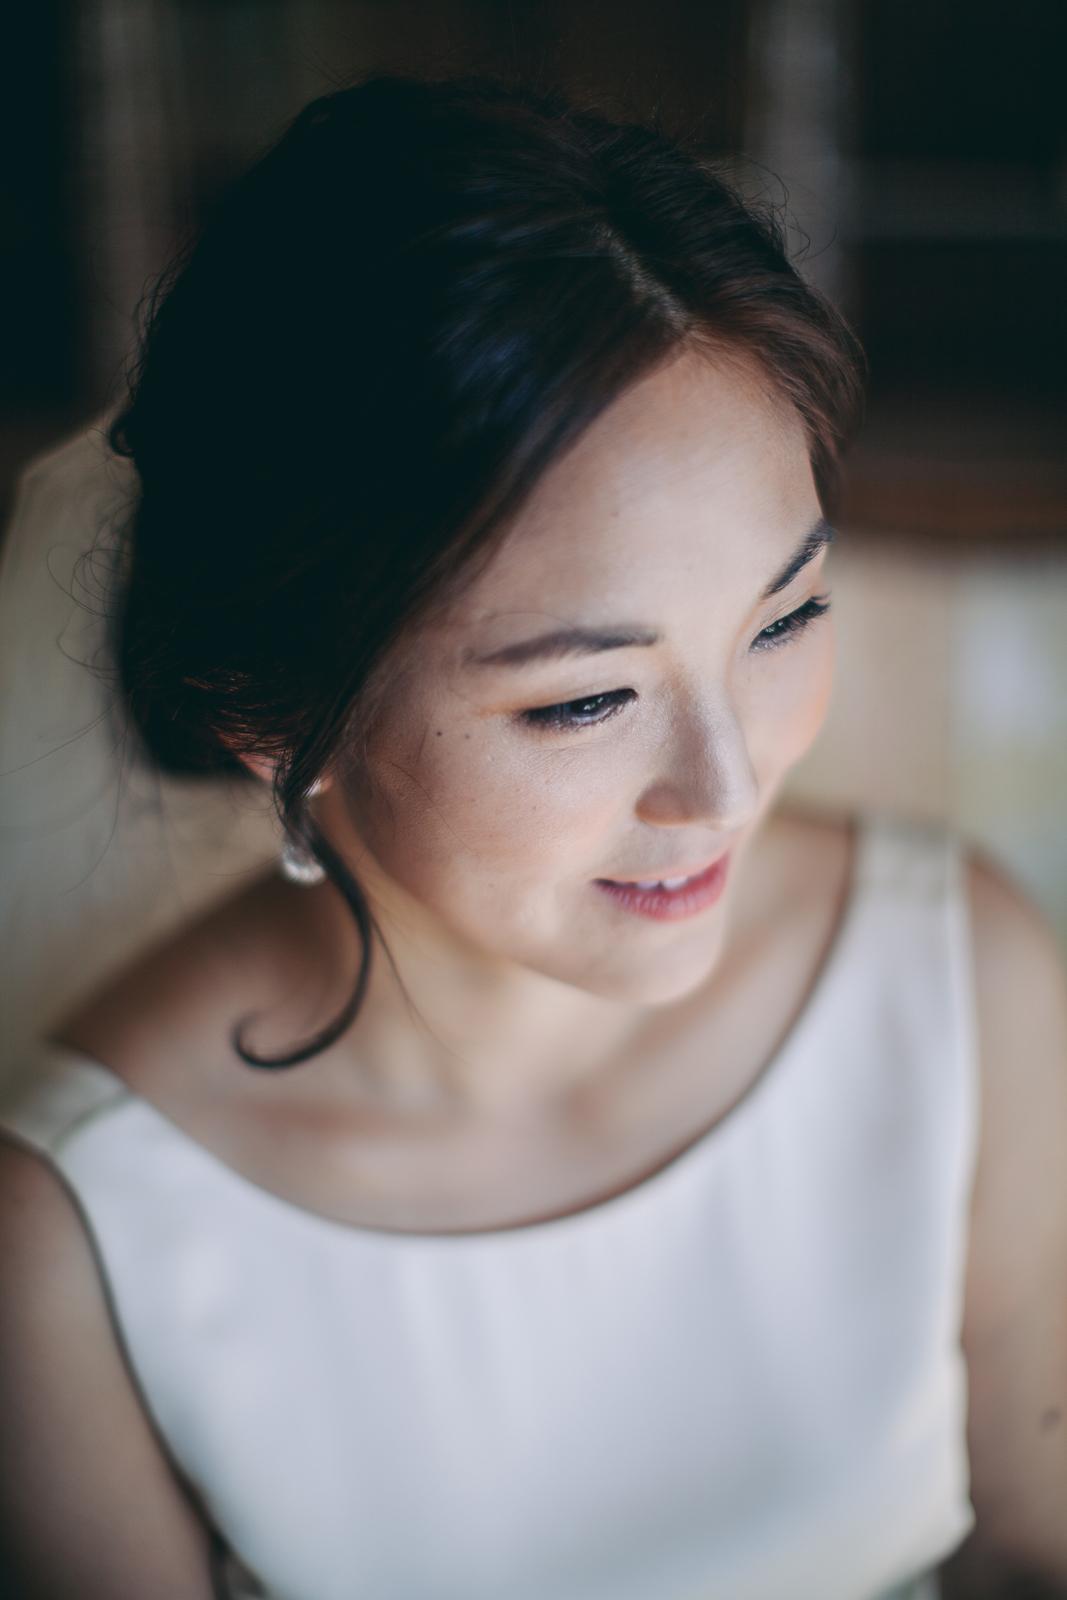 kohl_manison_wedding_photography_sarah_eric_ebony_siovhan_bokeh_photography_011.jpg